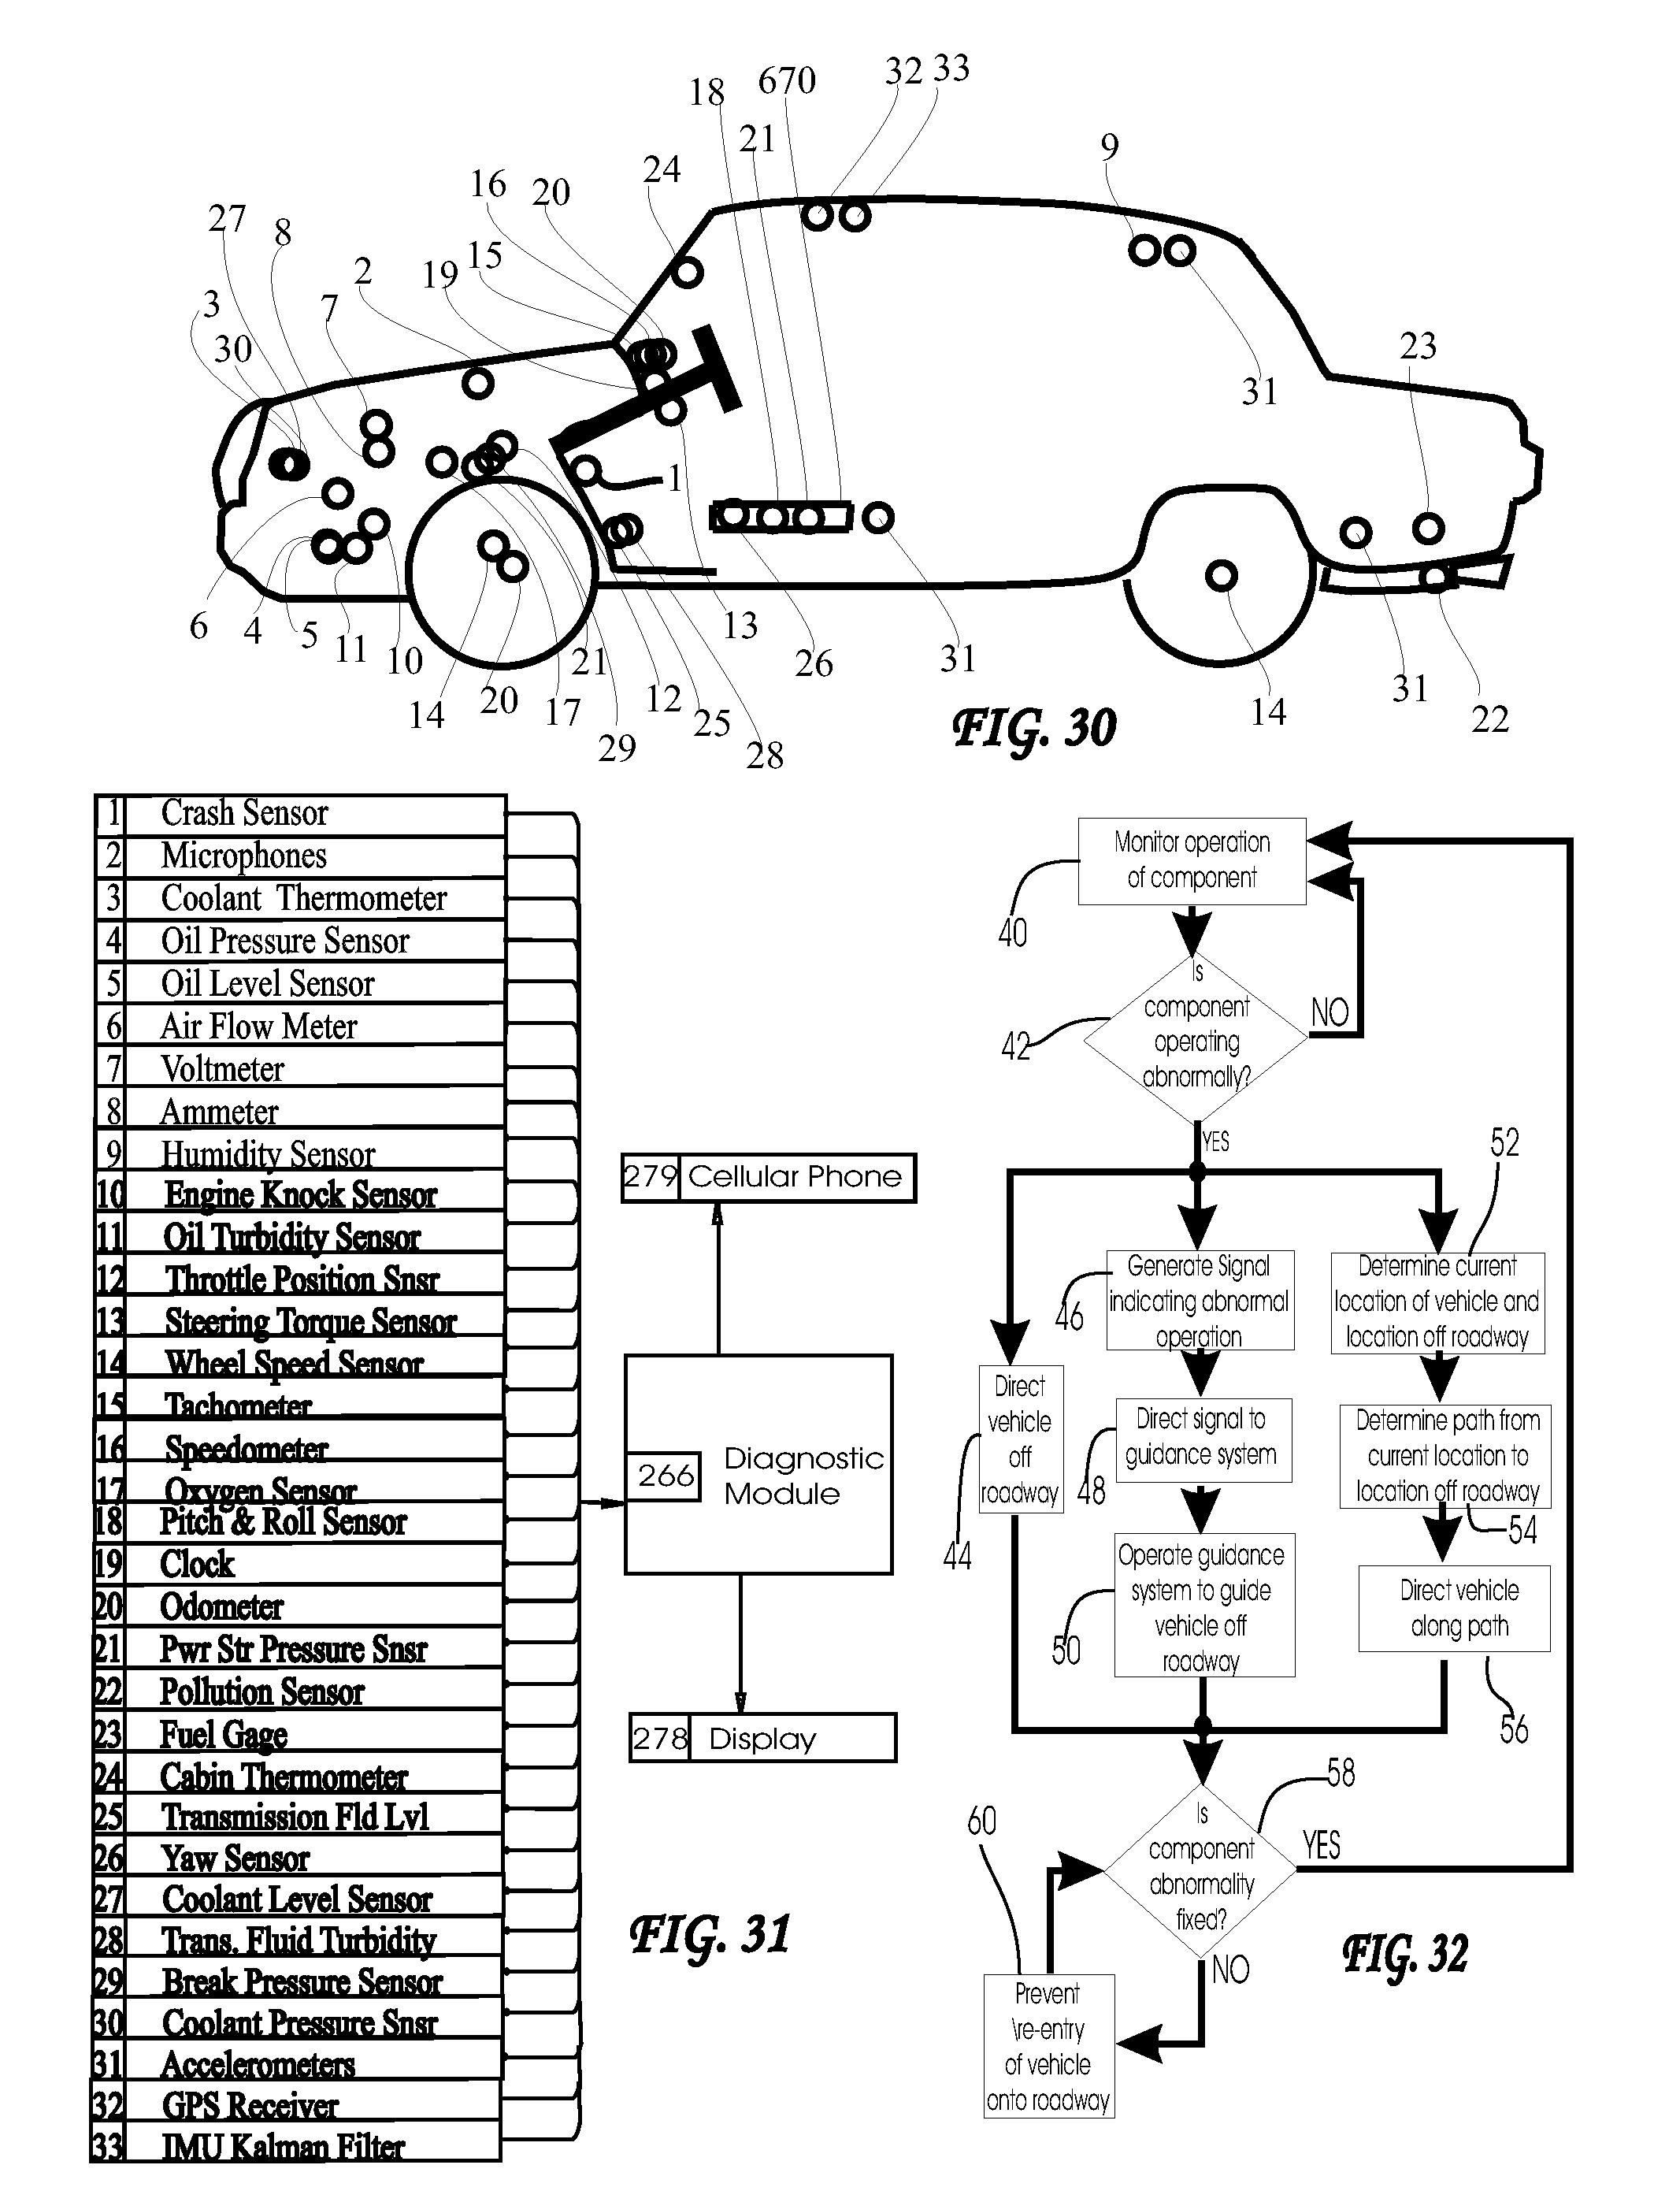 Patent US 7,744,122 B2